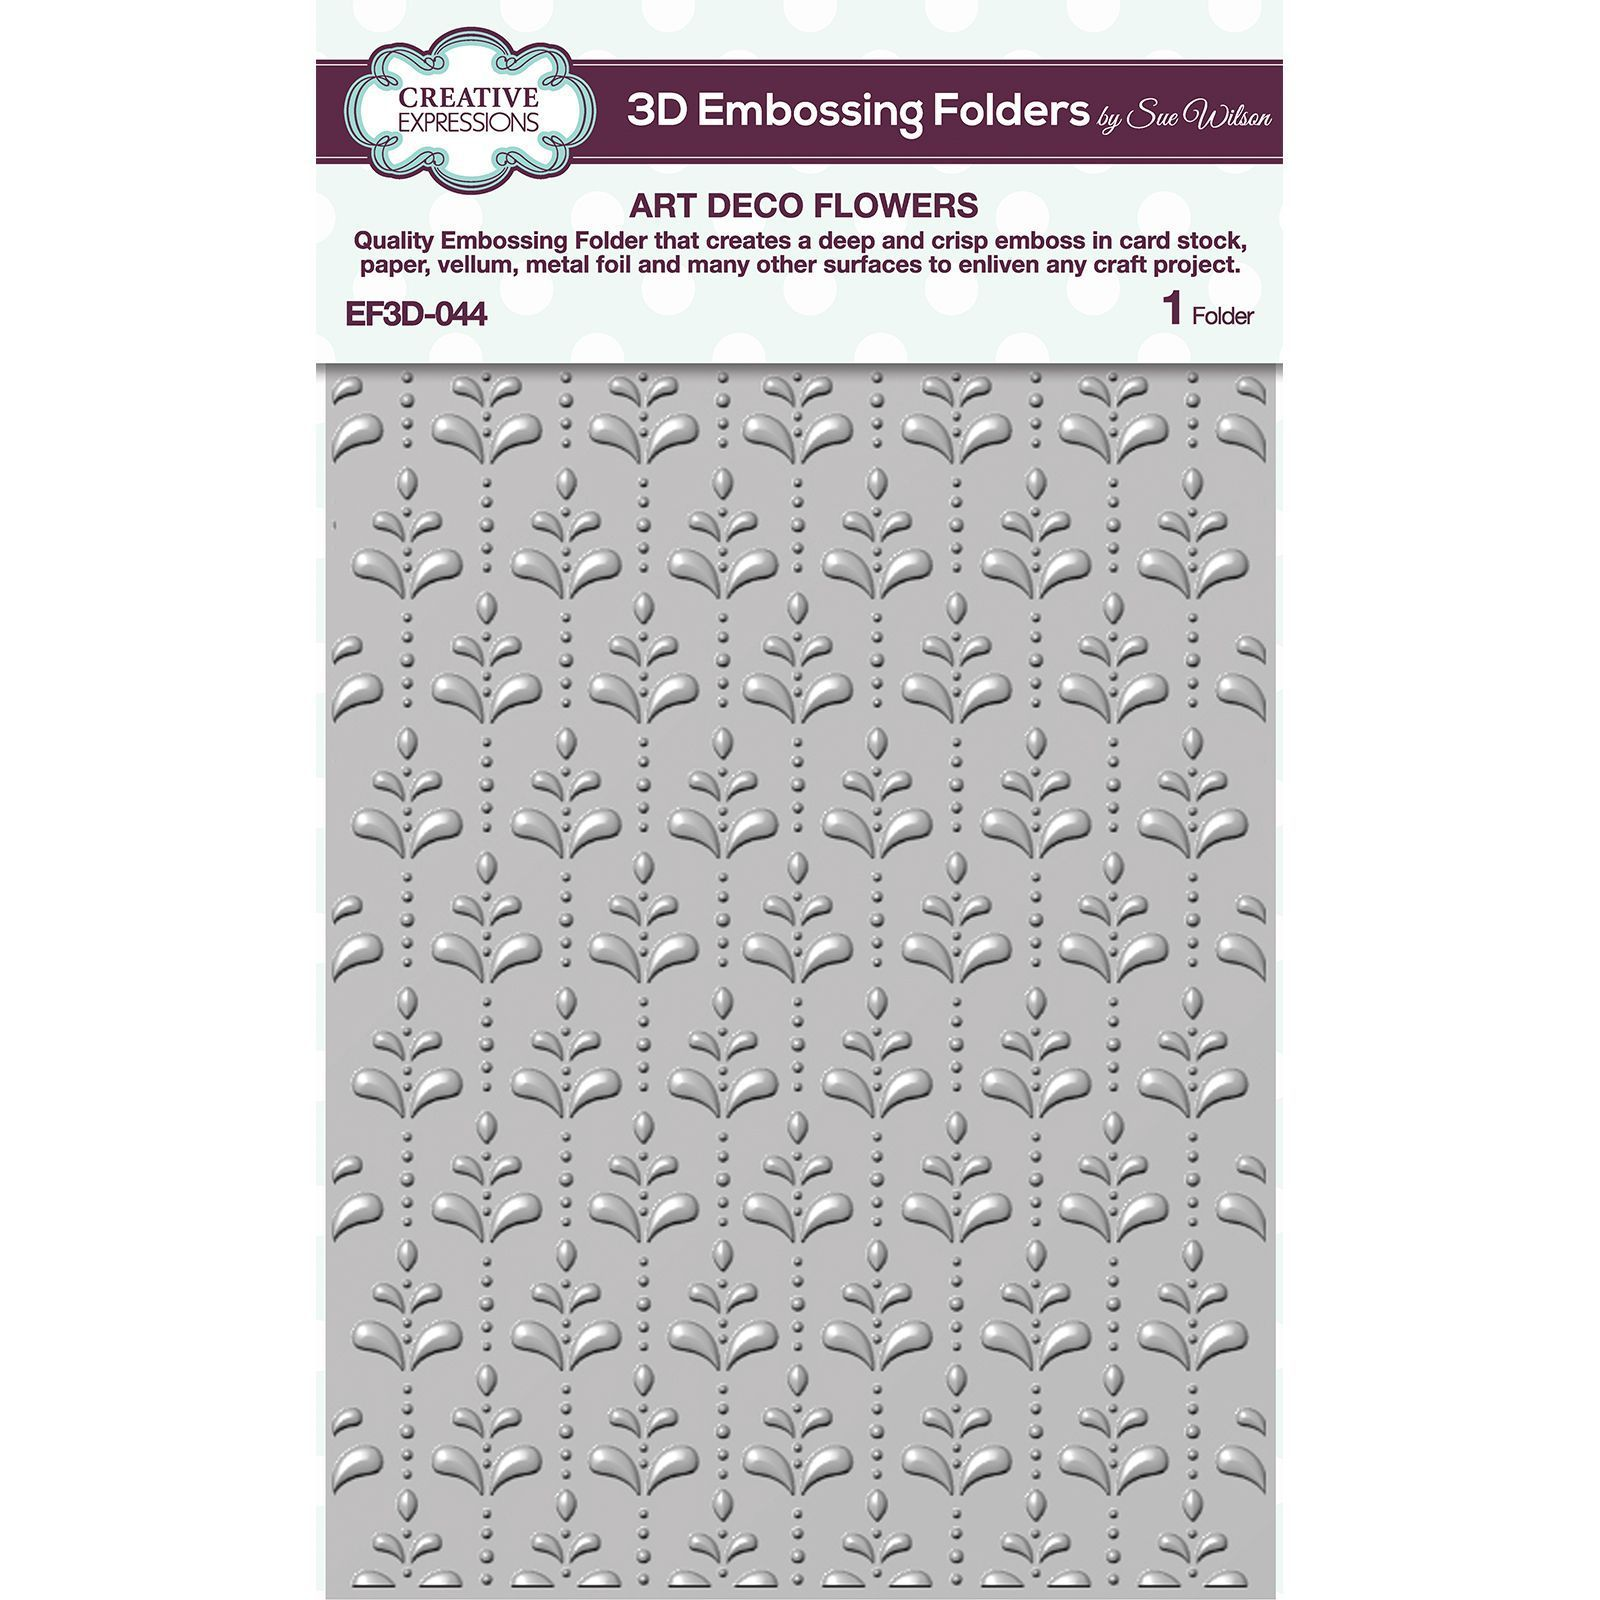 "Embossing 3D Folder 5.75\""X7.5\"" Art Deco Flowers"